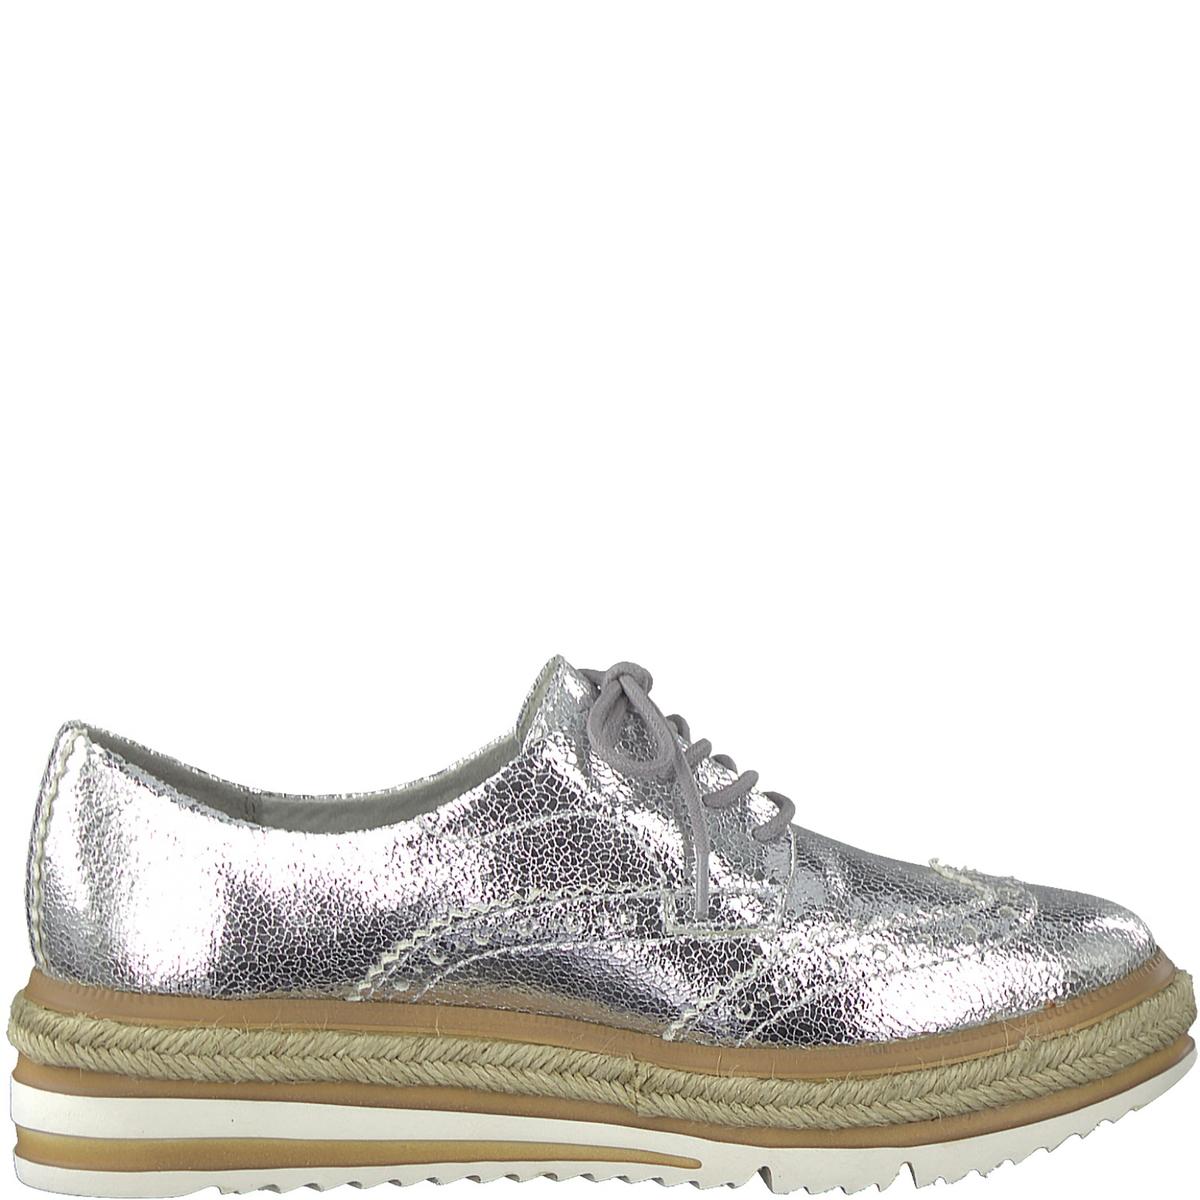 Ботинки-дерби Lepta ботинки дерби под кожу питона